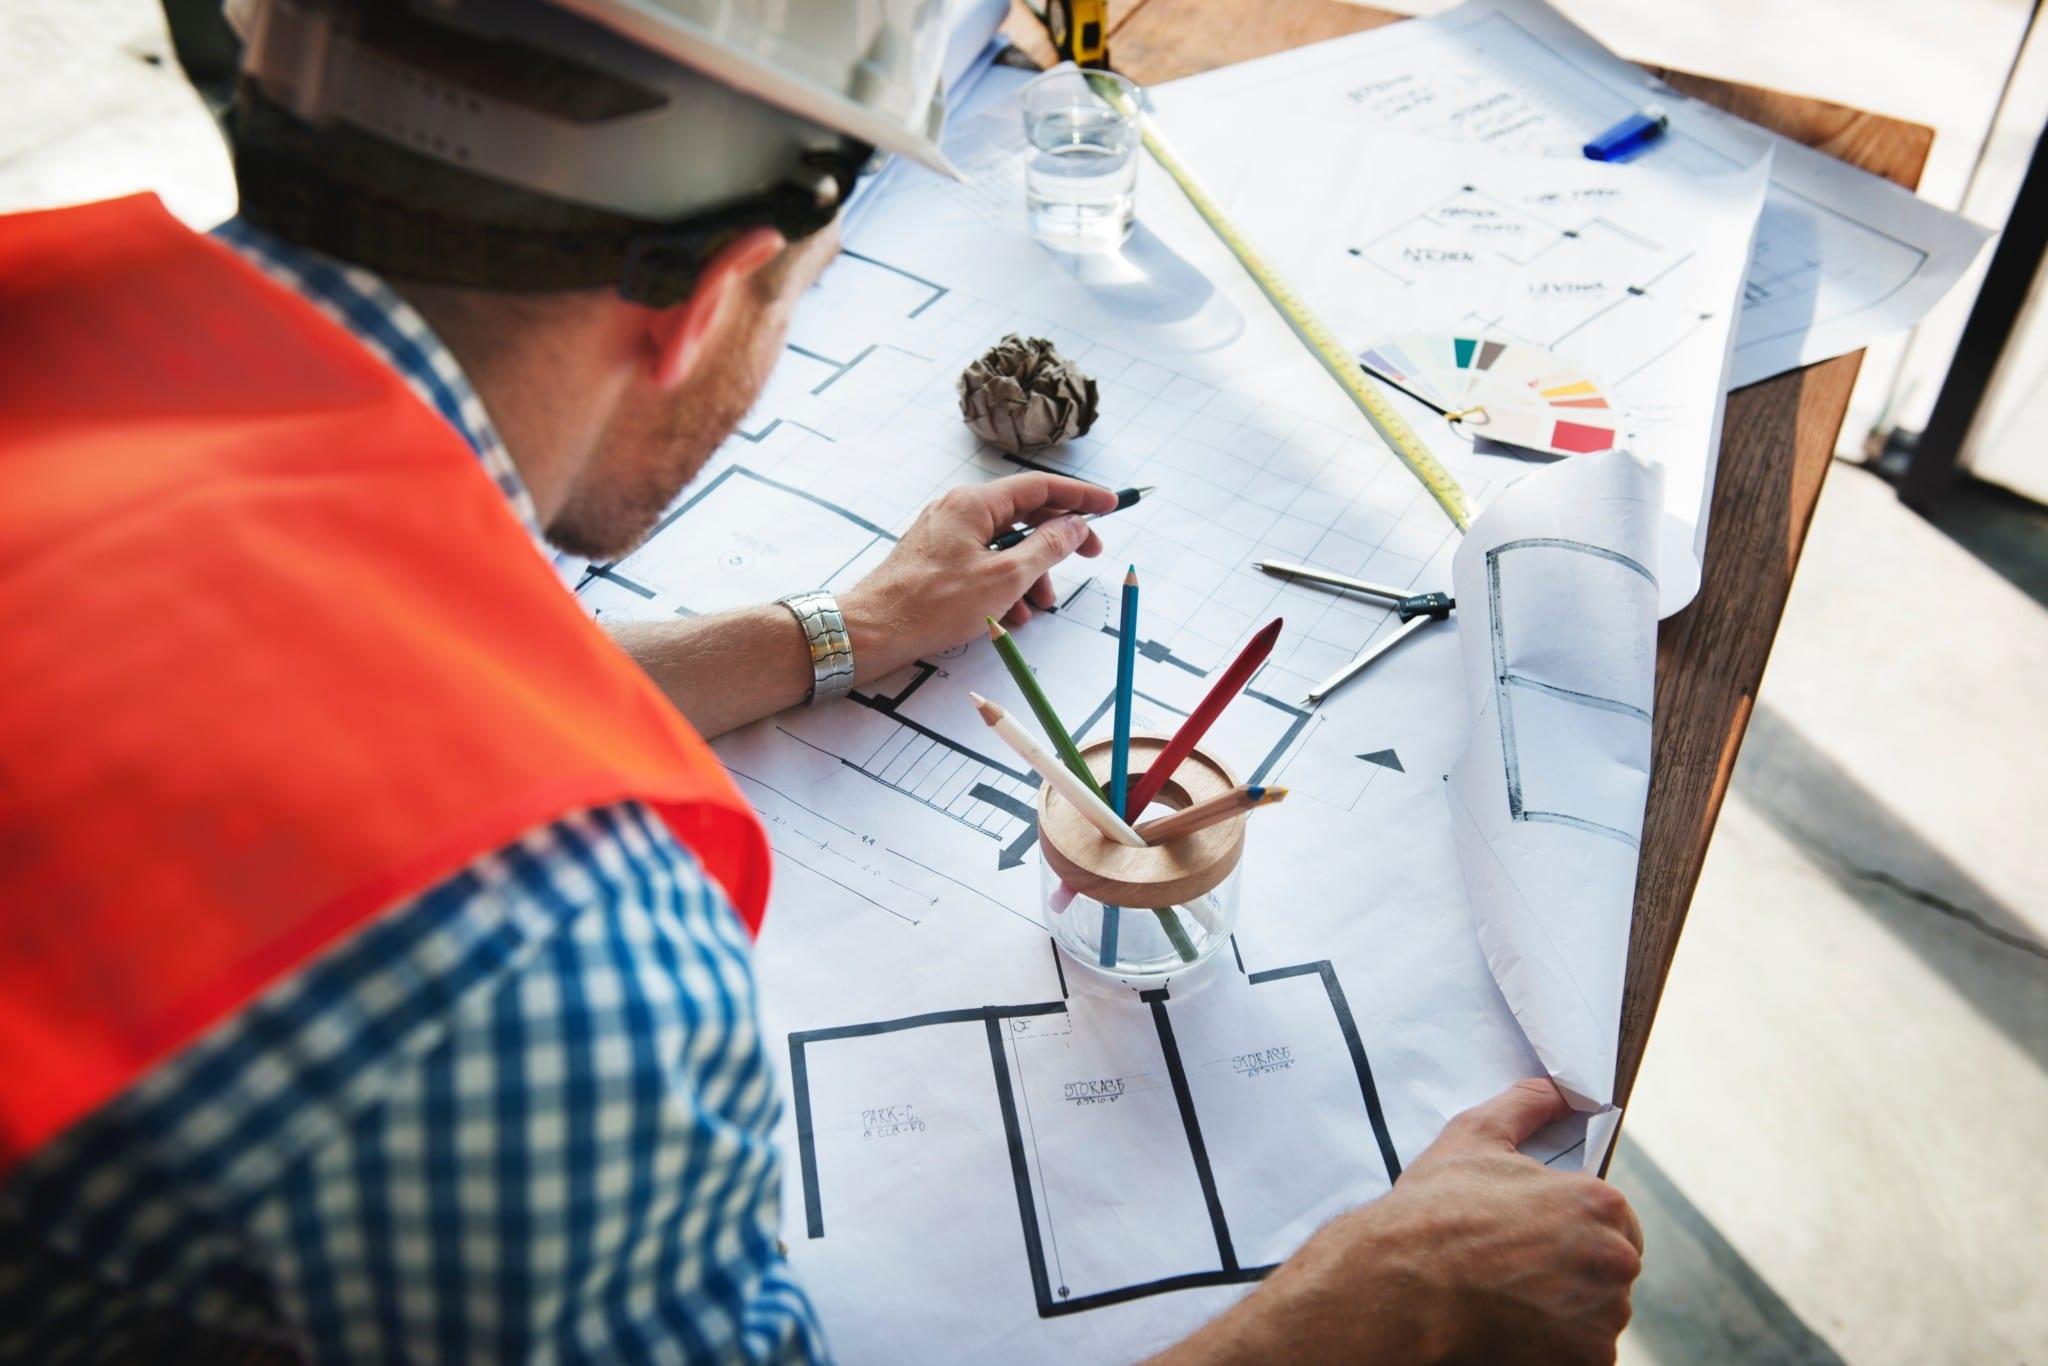 Construction worker looking over blueprints